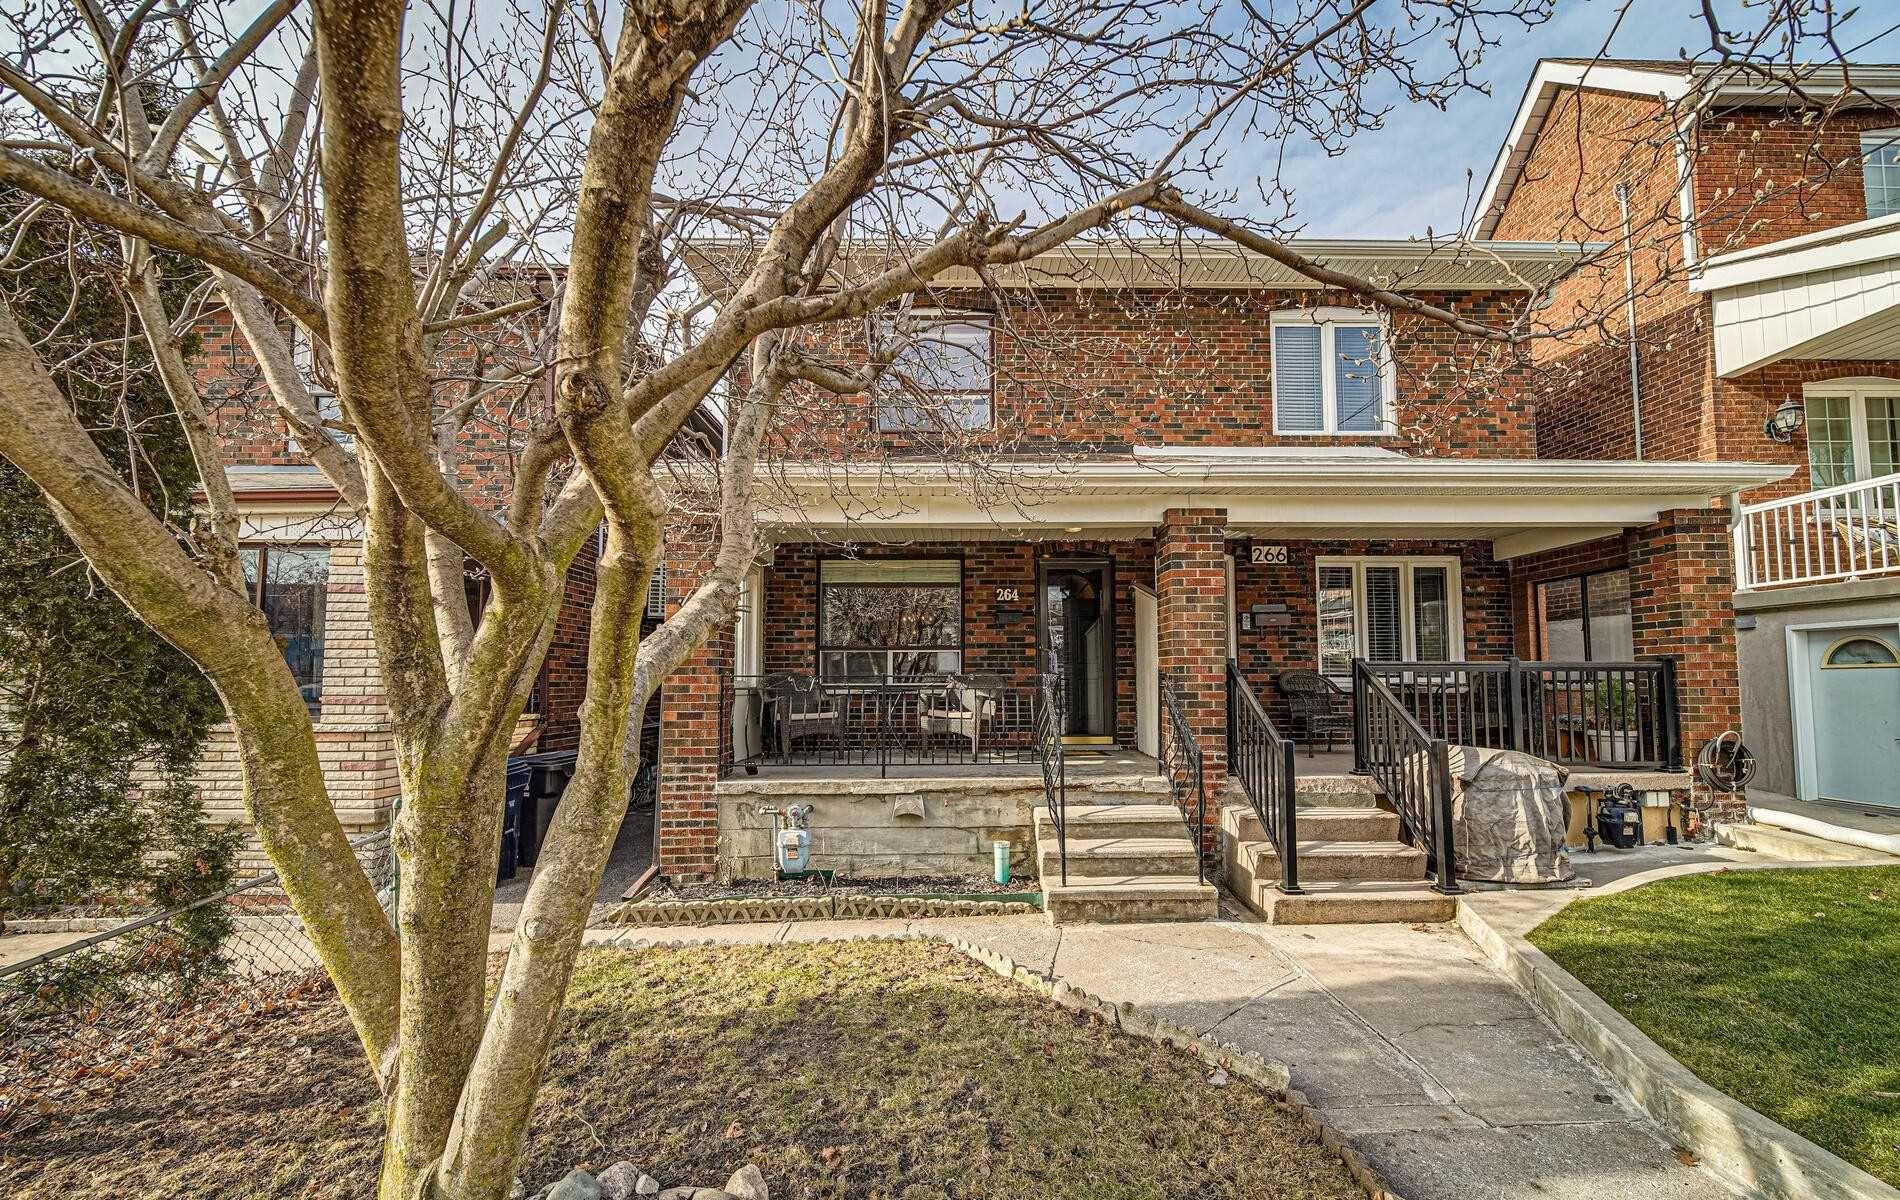 Main Photo: 264 Gilbert Avenue in Toronto: Caledonia-Fairbank House (2-Storey) for sale (Toronto W03)  : MLS®# W5095155